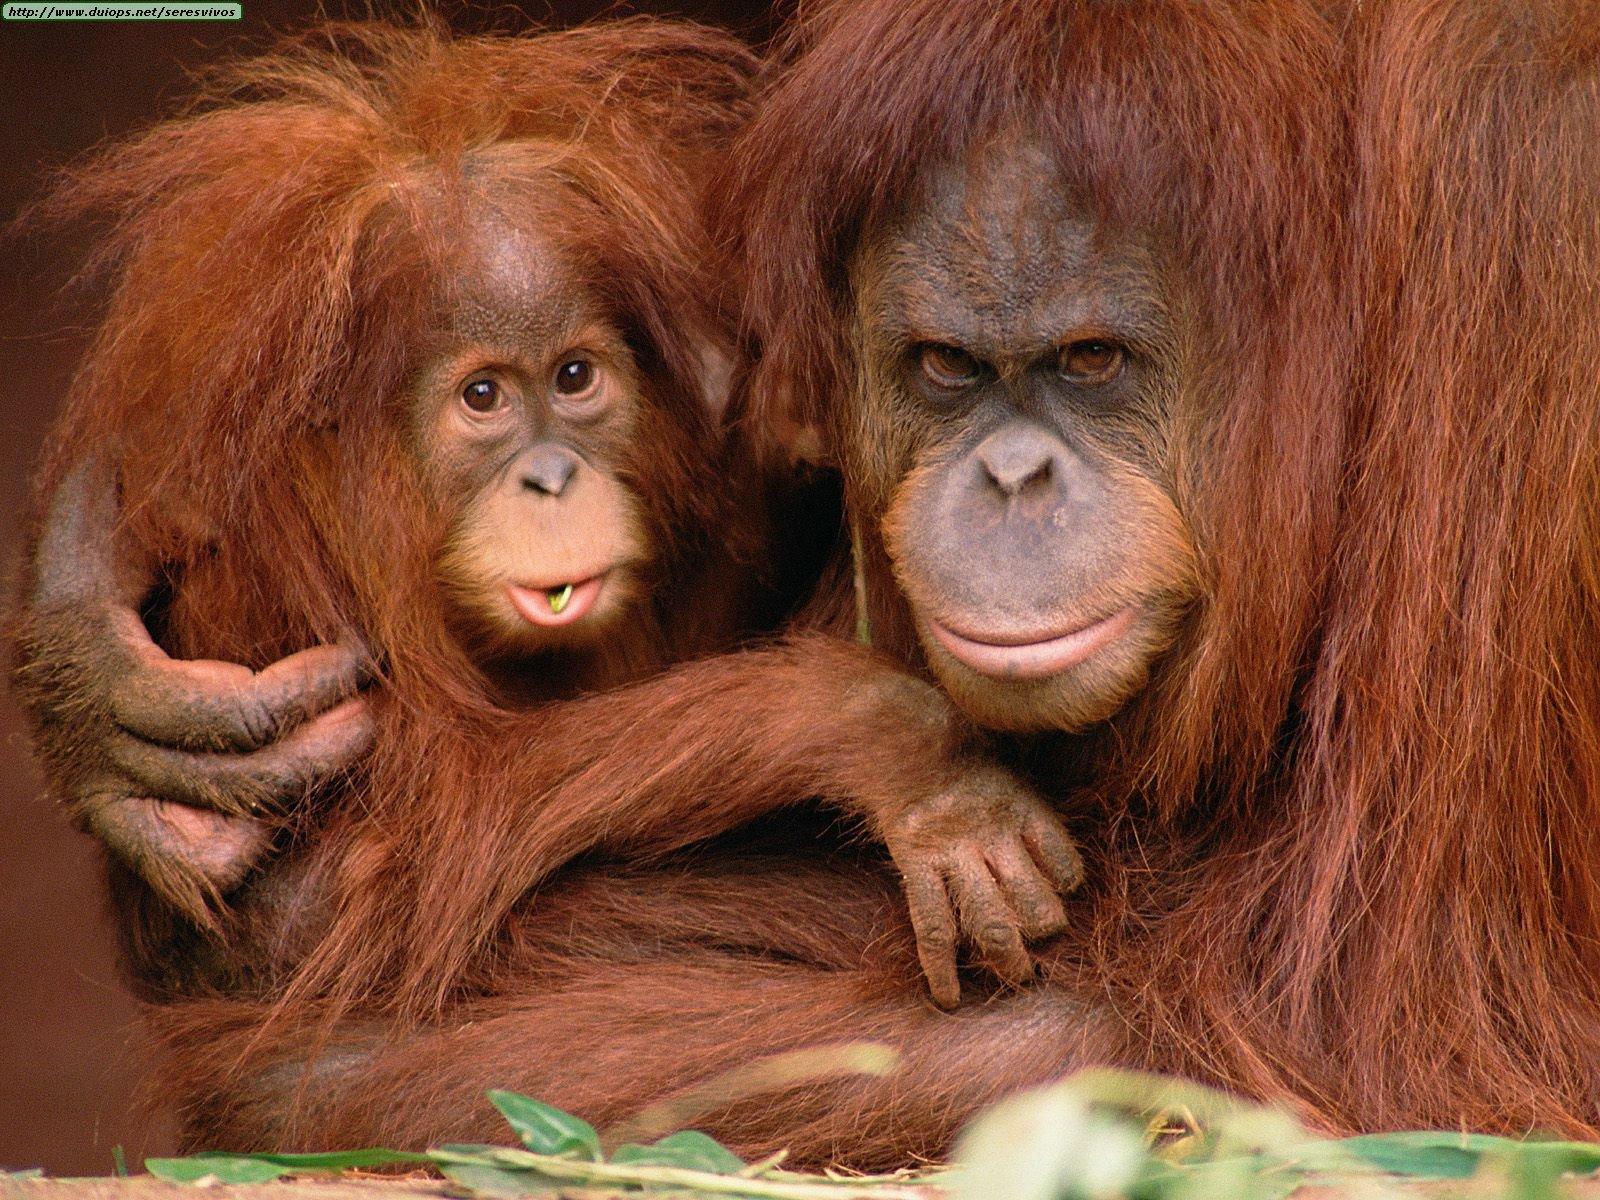 http://www.duiops.net/seresvivos/galeria/orangutanes/Very%20Protective,%20Orangutans.jpg